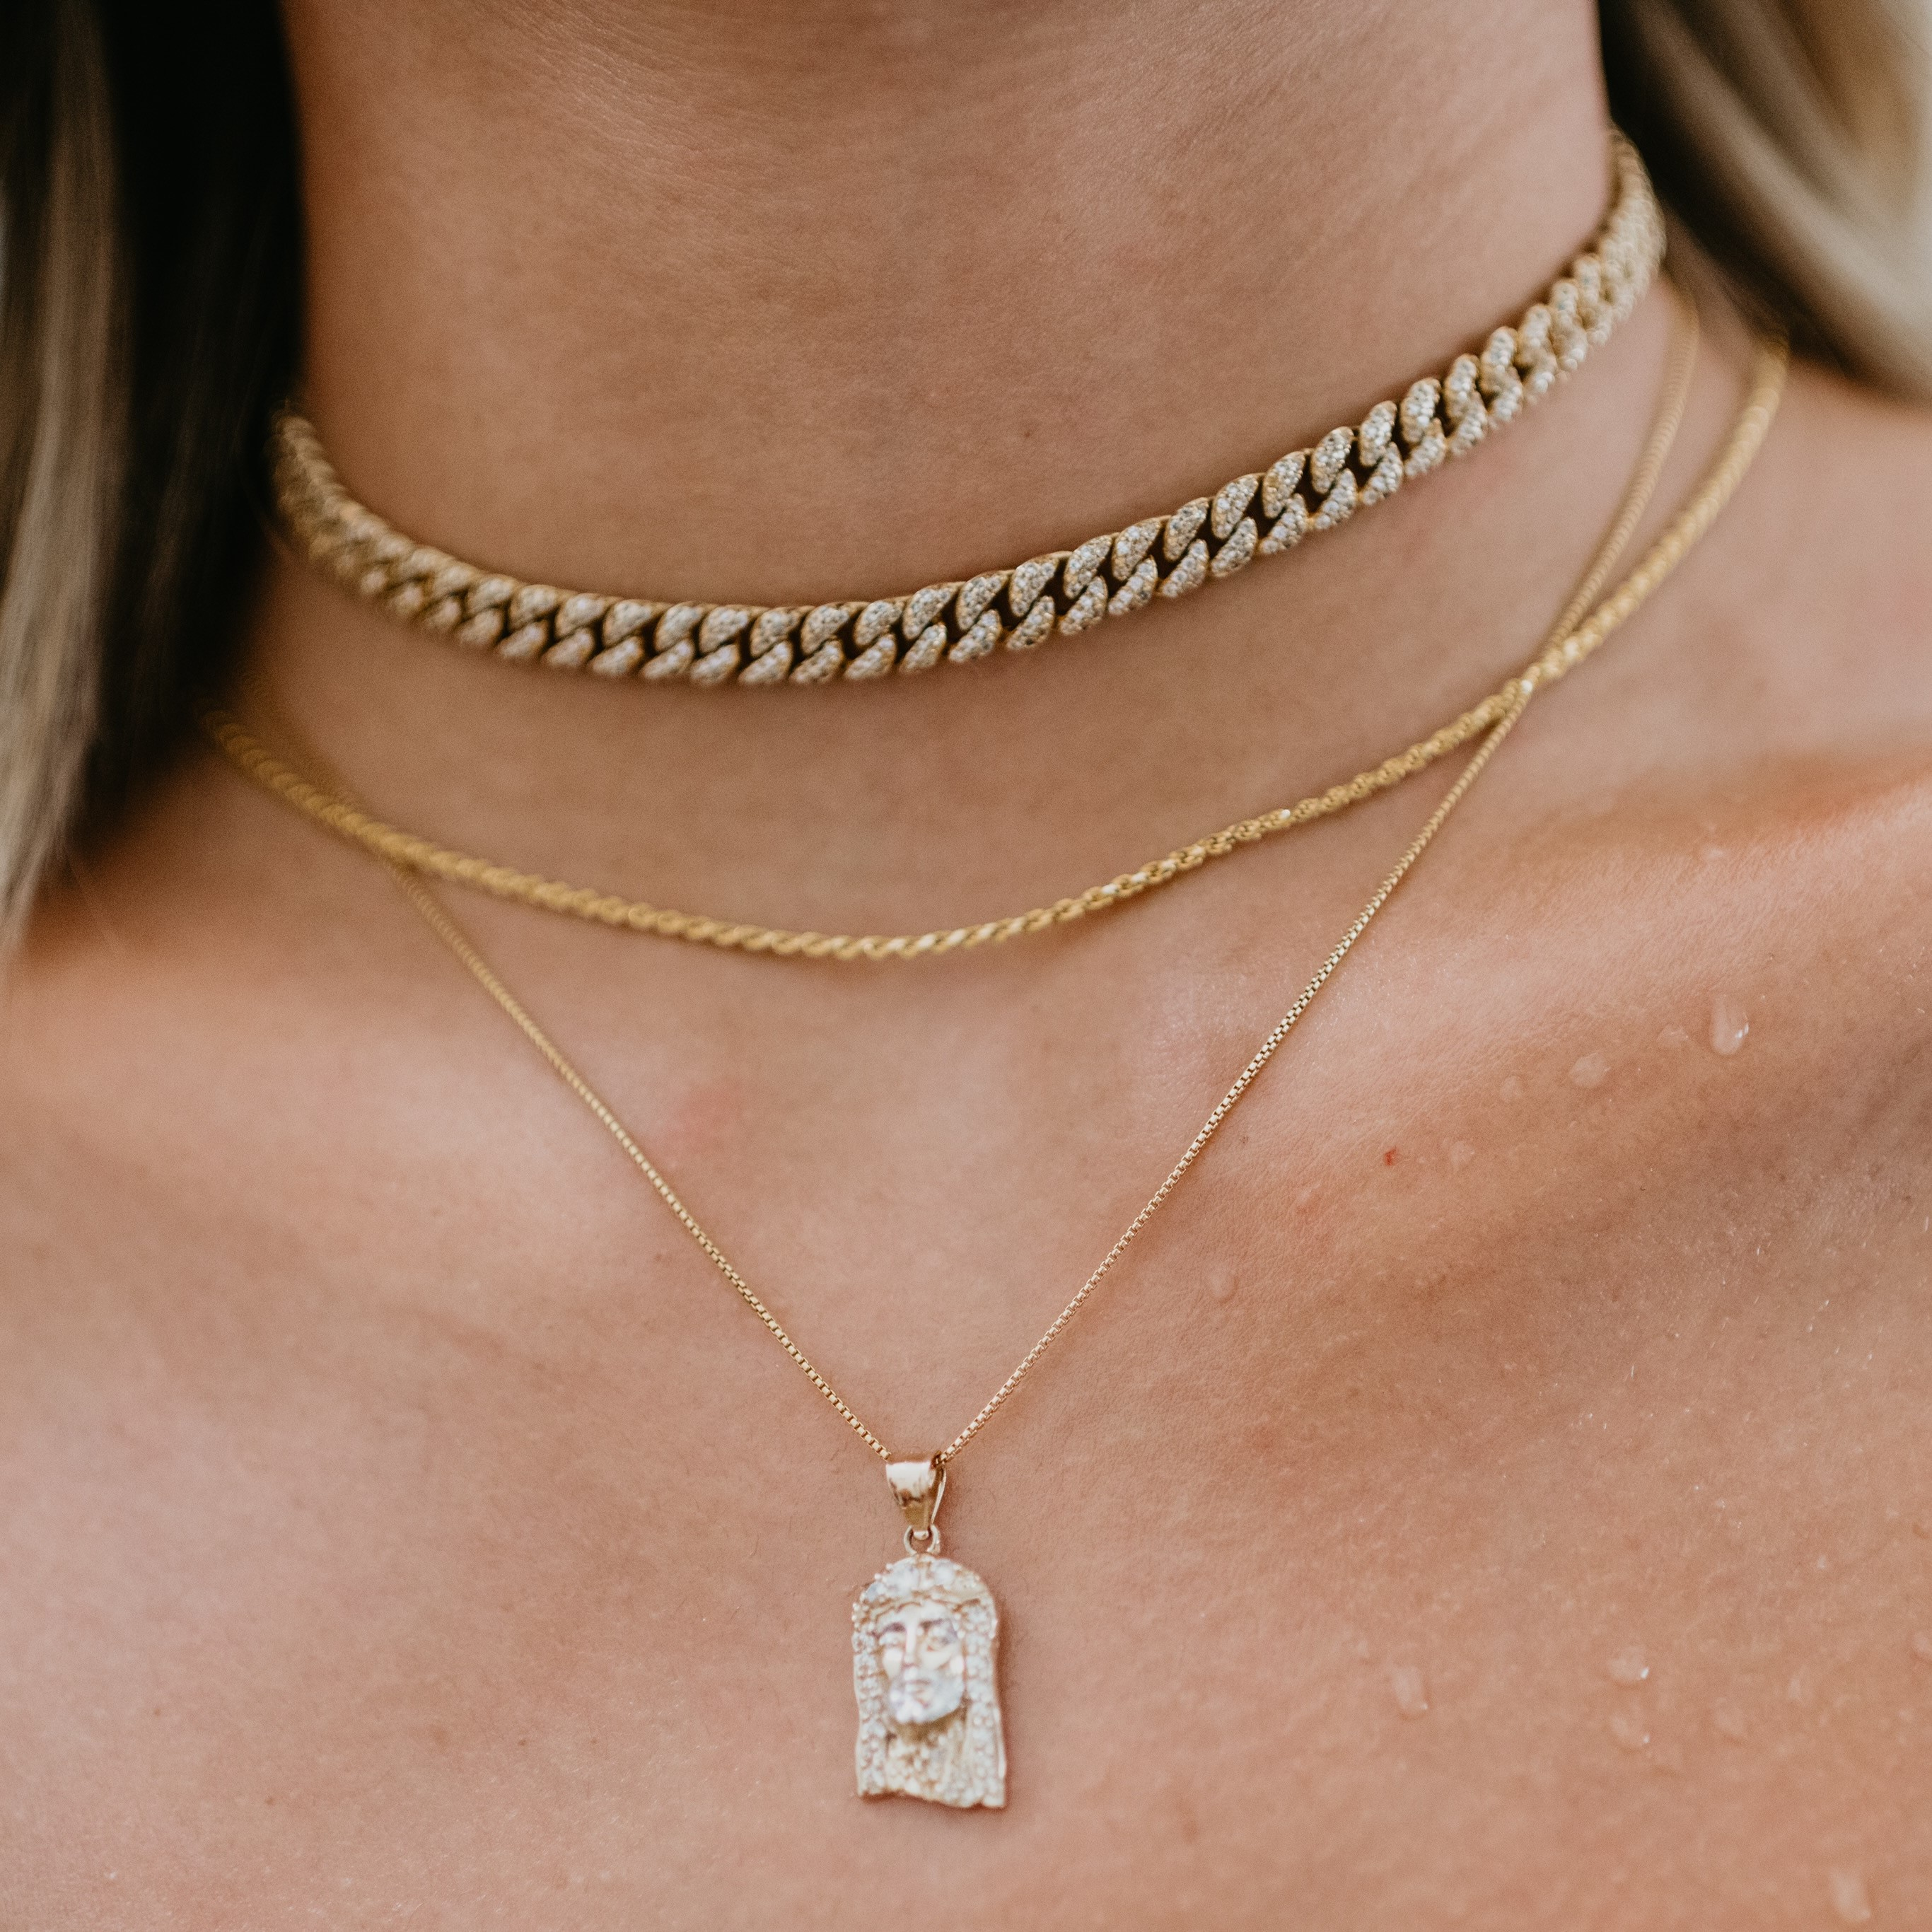 Close up of Cuban Choker with pendant